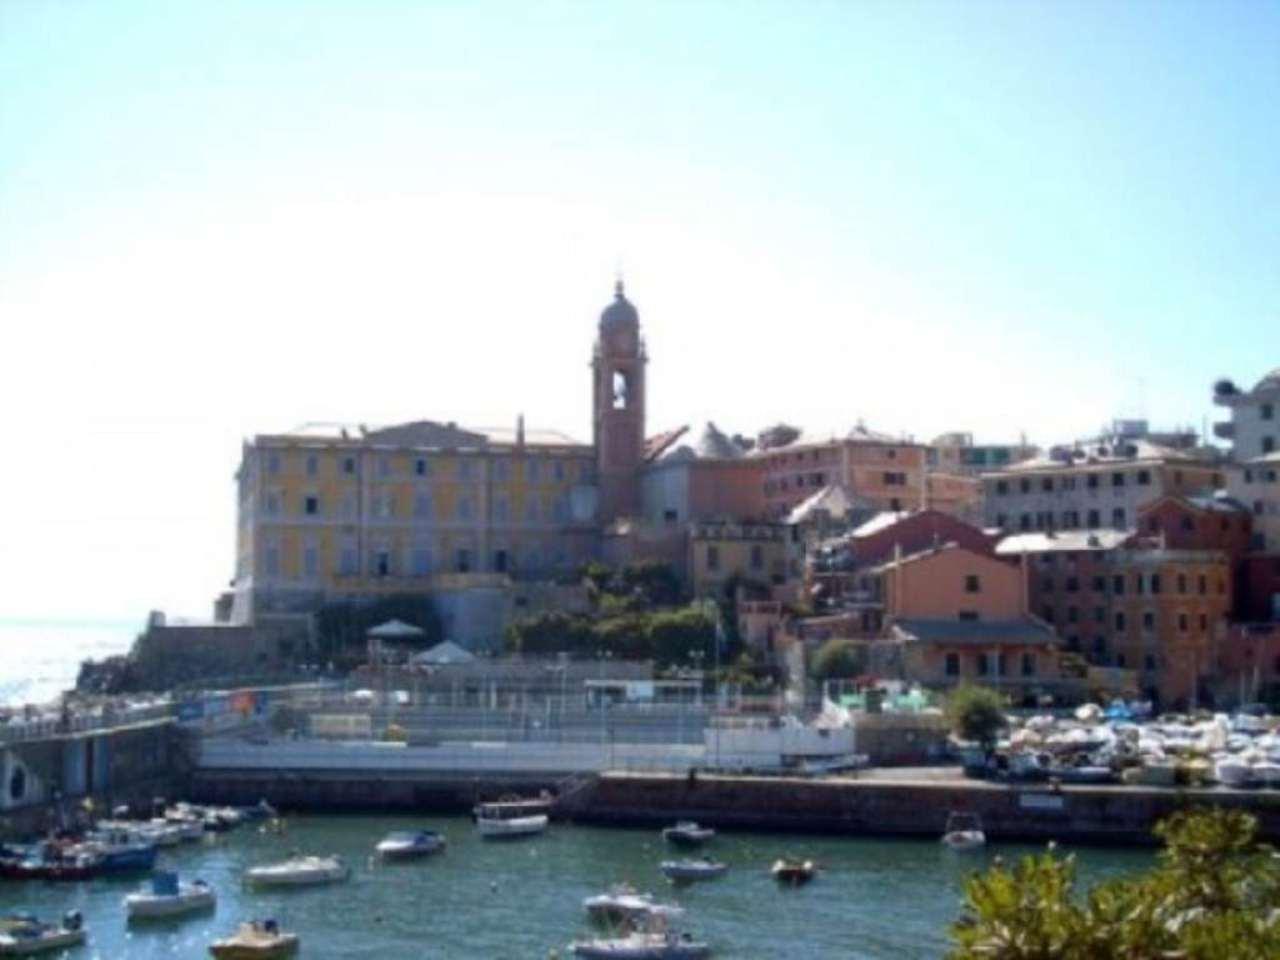 Bilocale Genova Via Felice Gazzolo 1